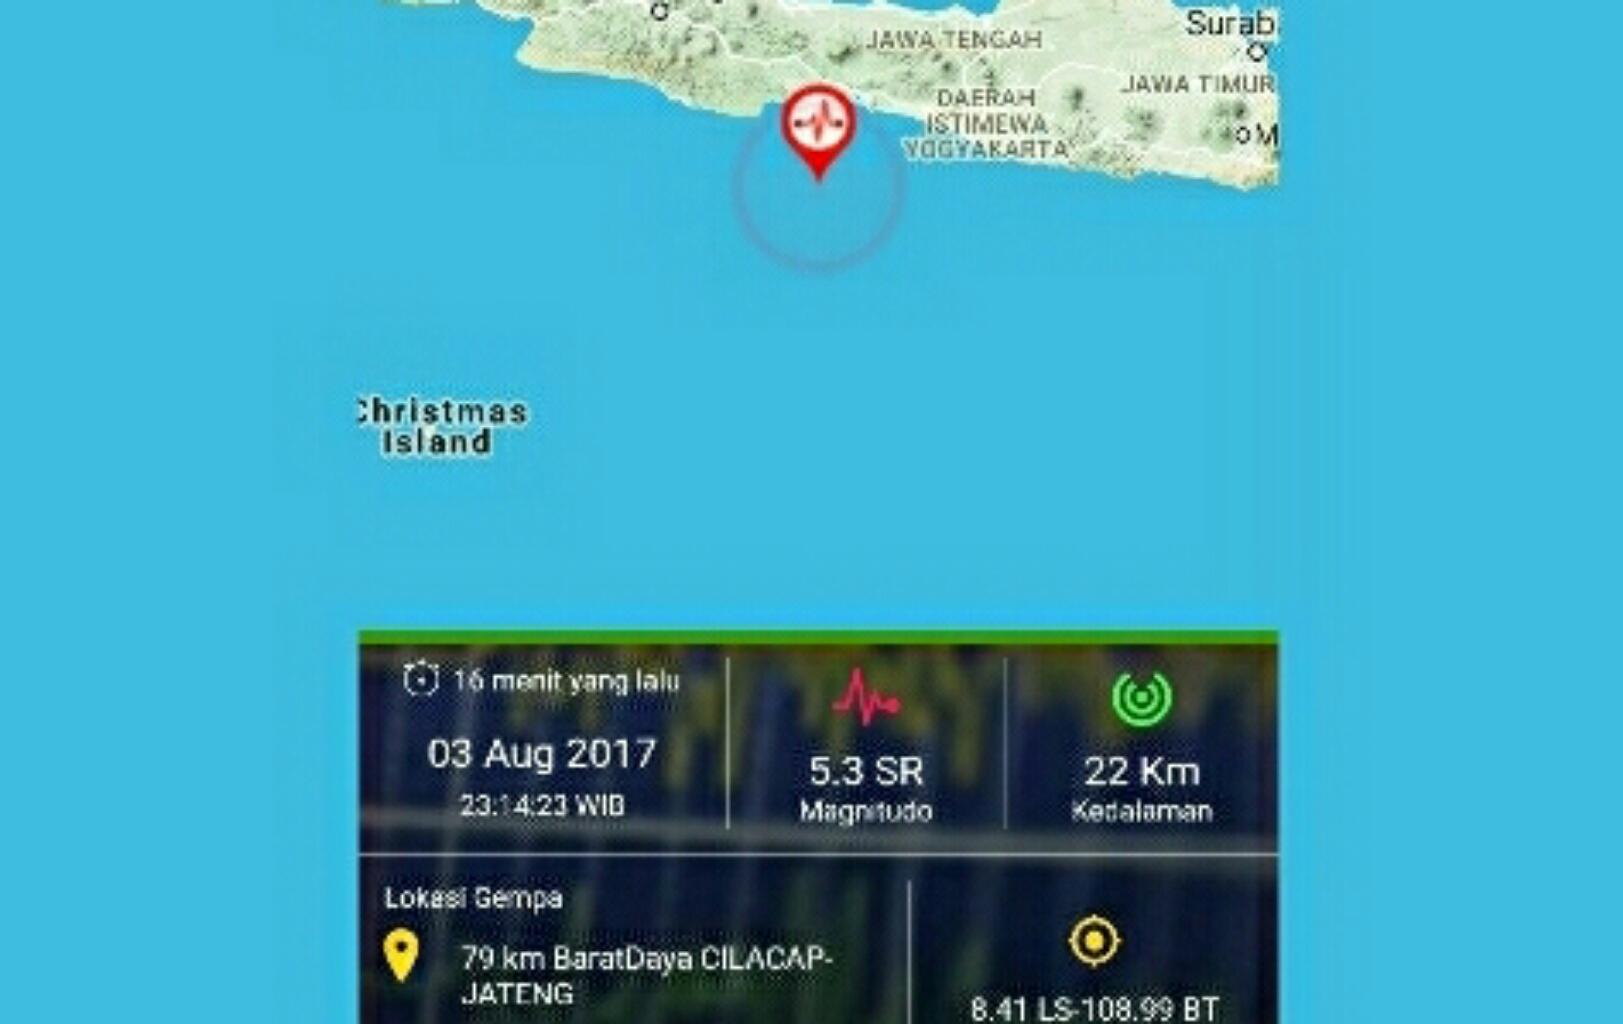 Warga Tasik Di Kagetkan Gempa 5.3 SR Berasal Dari Cilacap